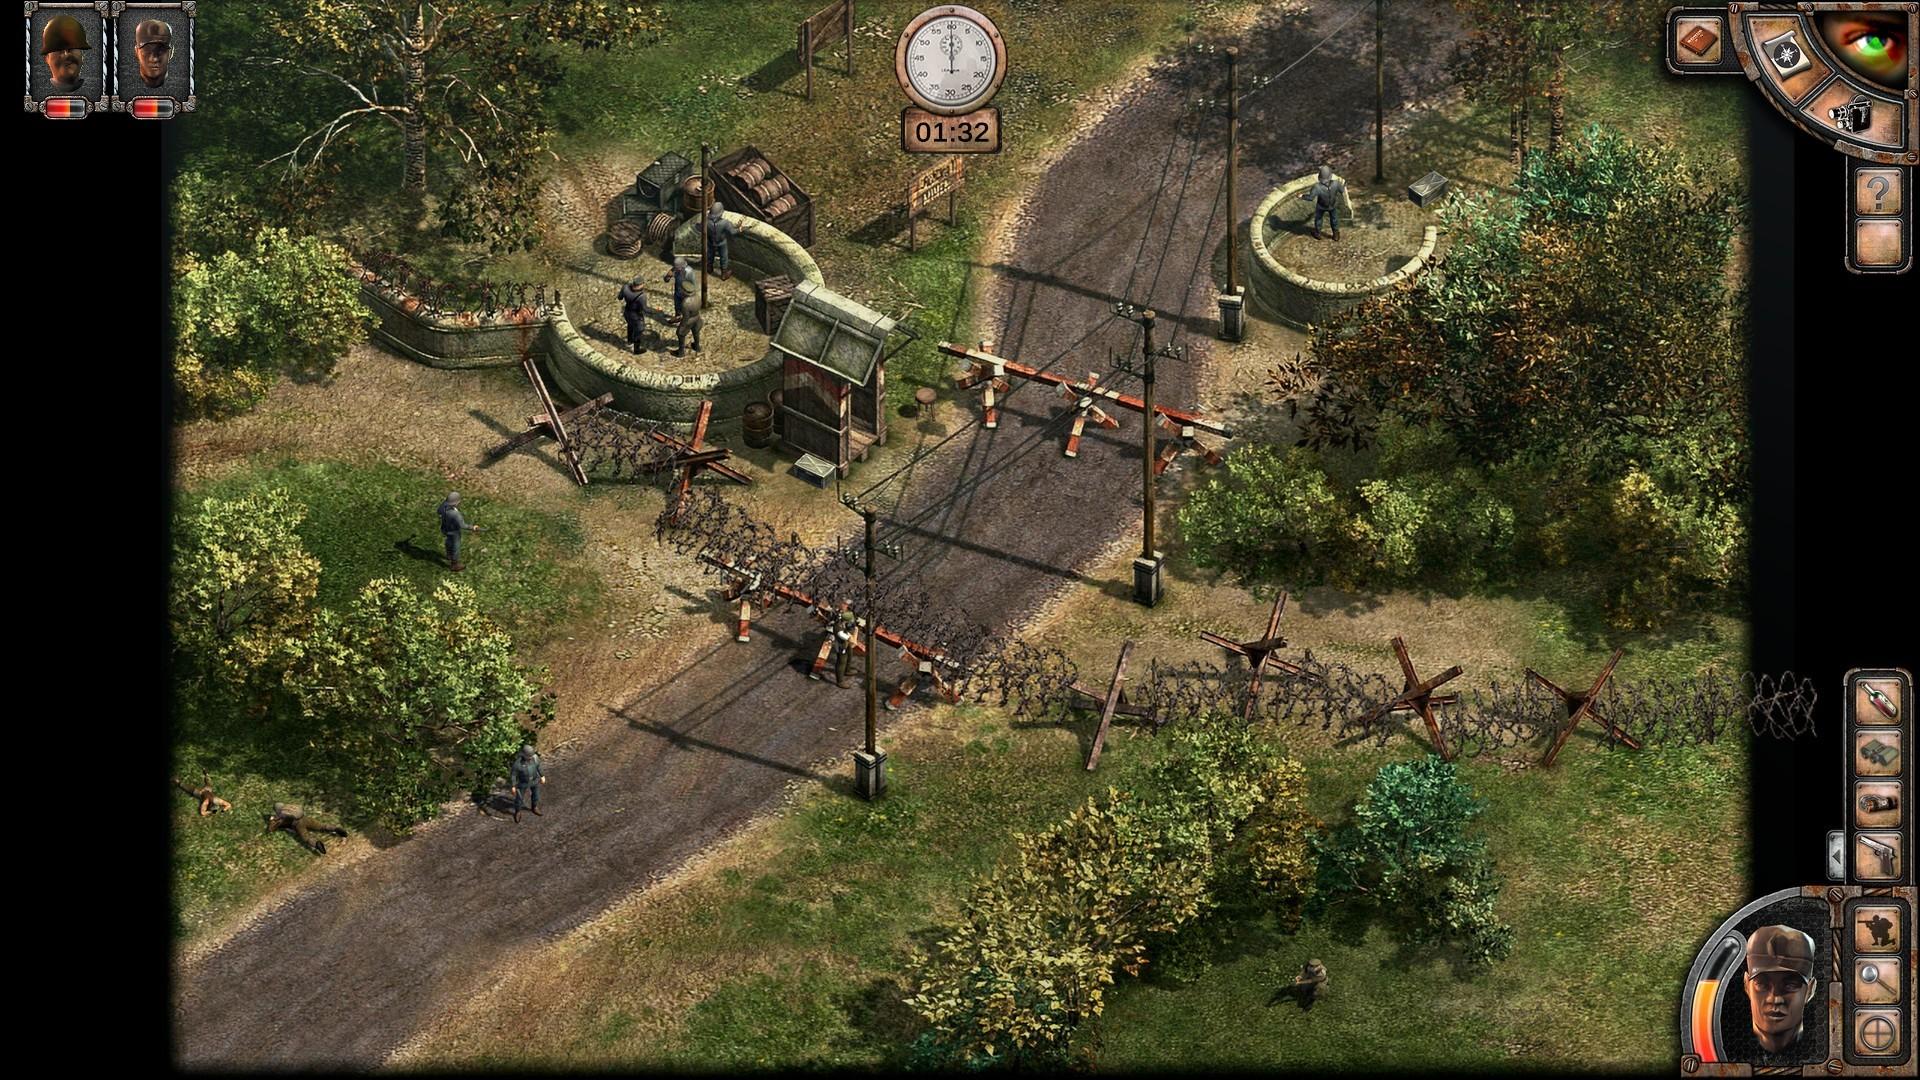 commandos-2-hd-remaster-praetorians-hd-remaster (2)